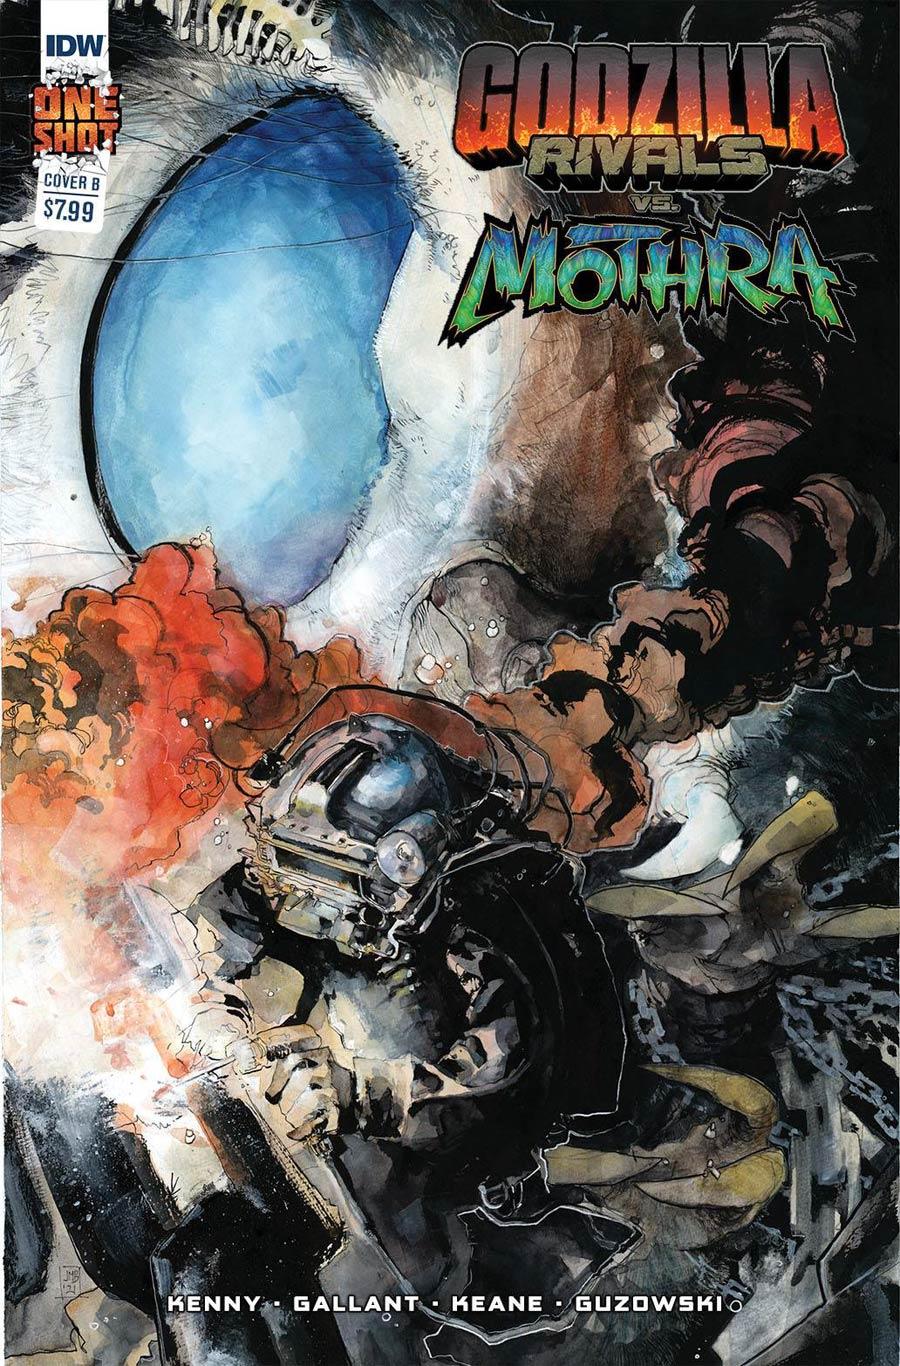 Godzilla Rivals vs Mothra #1 (One Shot) Cover B Incentive Jeffrey Veregge Variant Cover